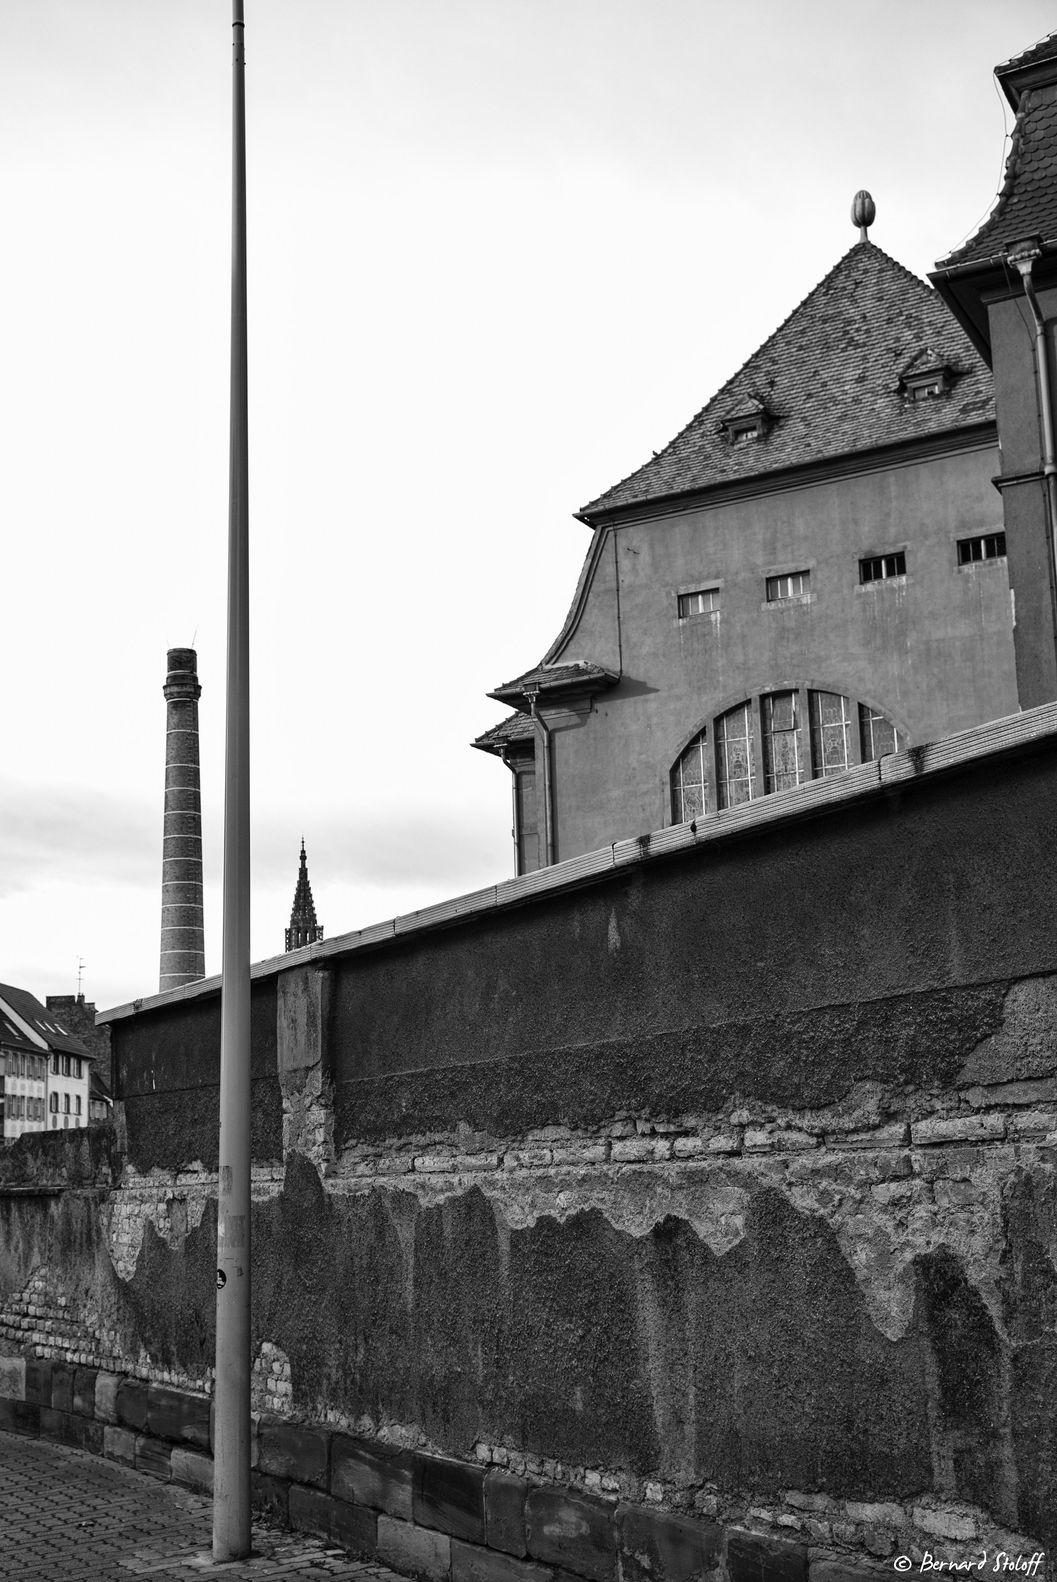 LA CATHEDRALE DE STRASBOURG MILLENAIRE